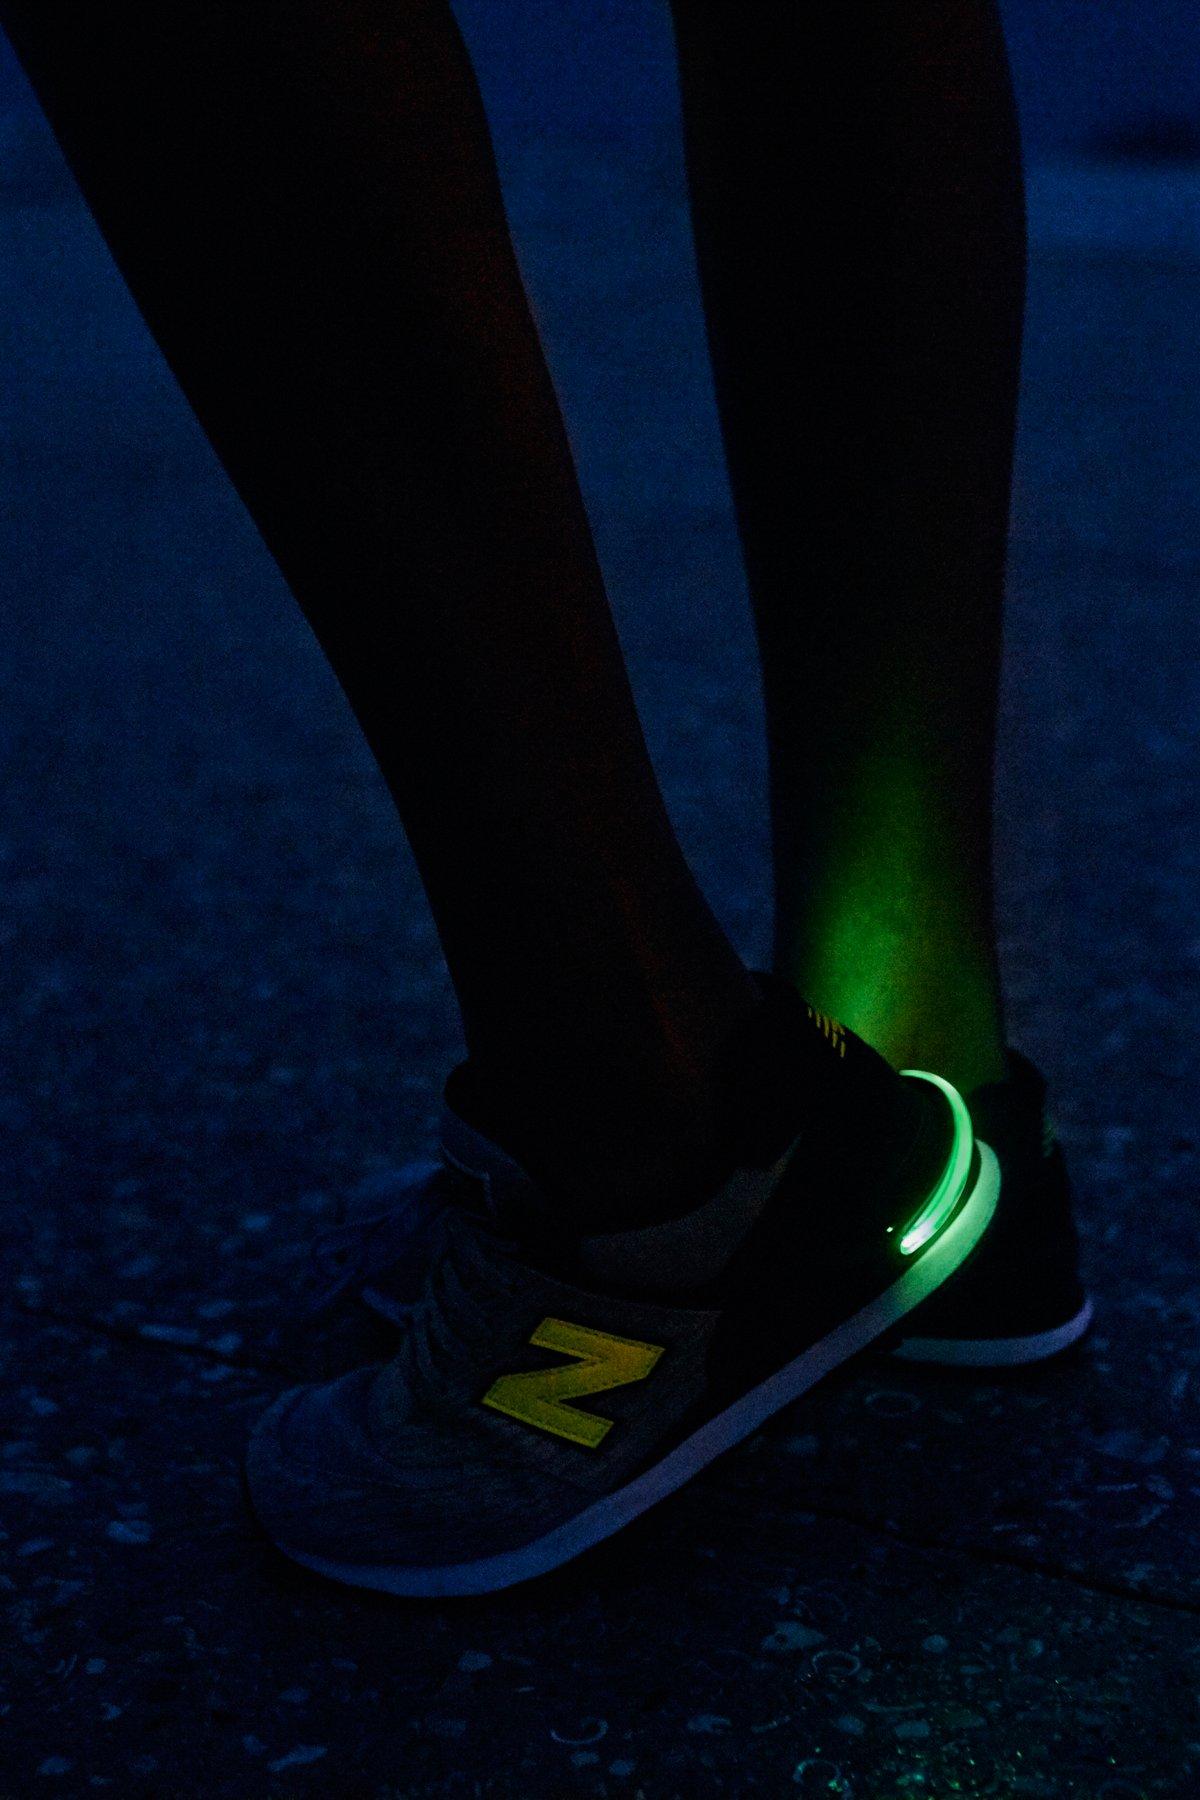 LED跑鞋夹灯